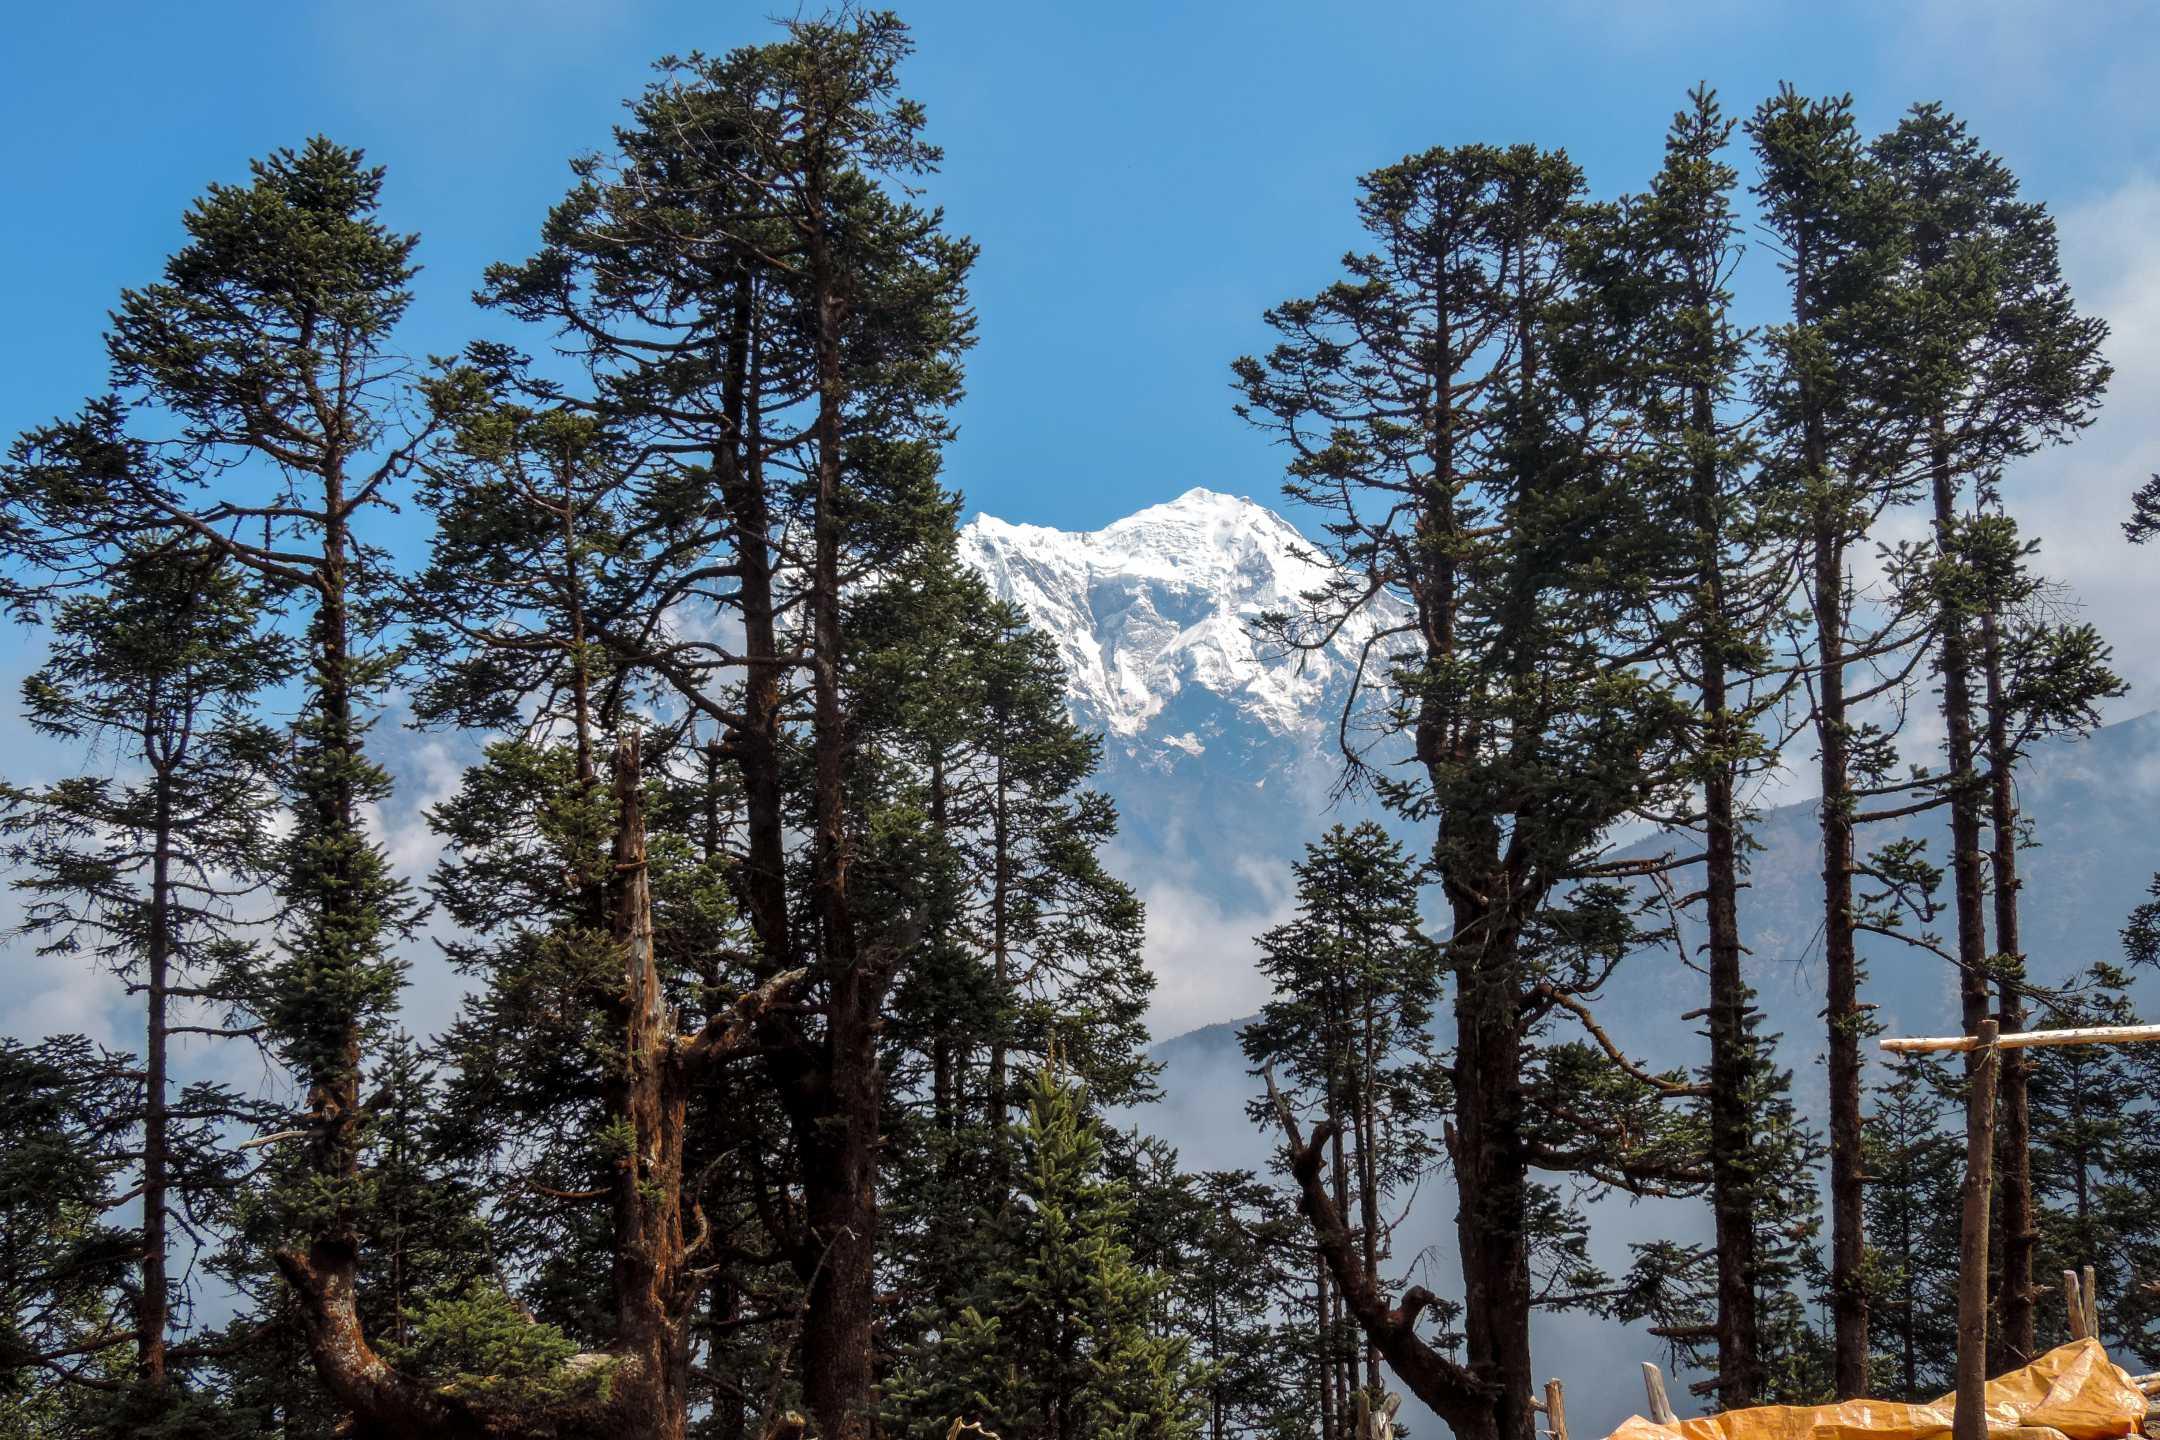 Tamang mountains and trees